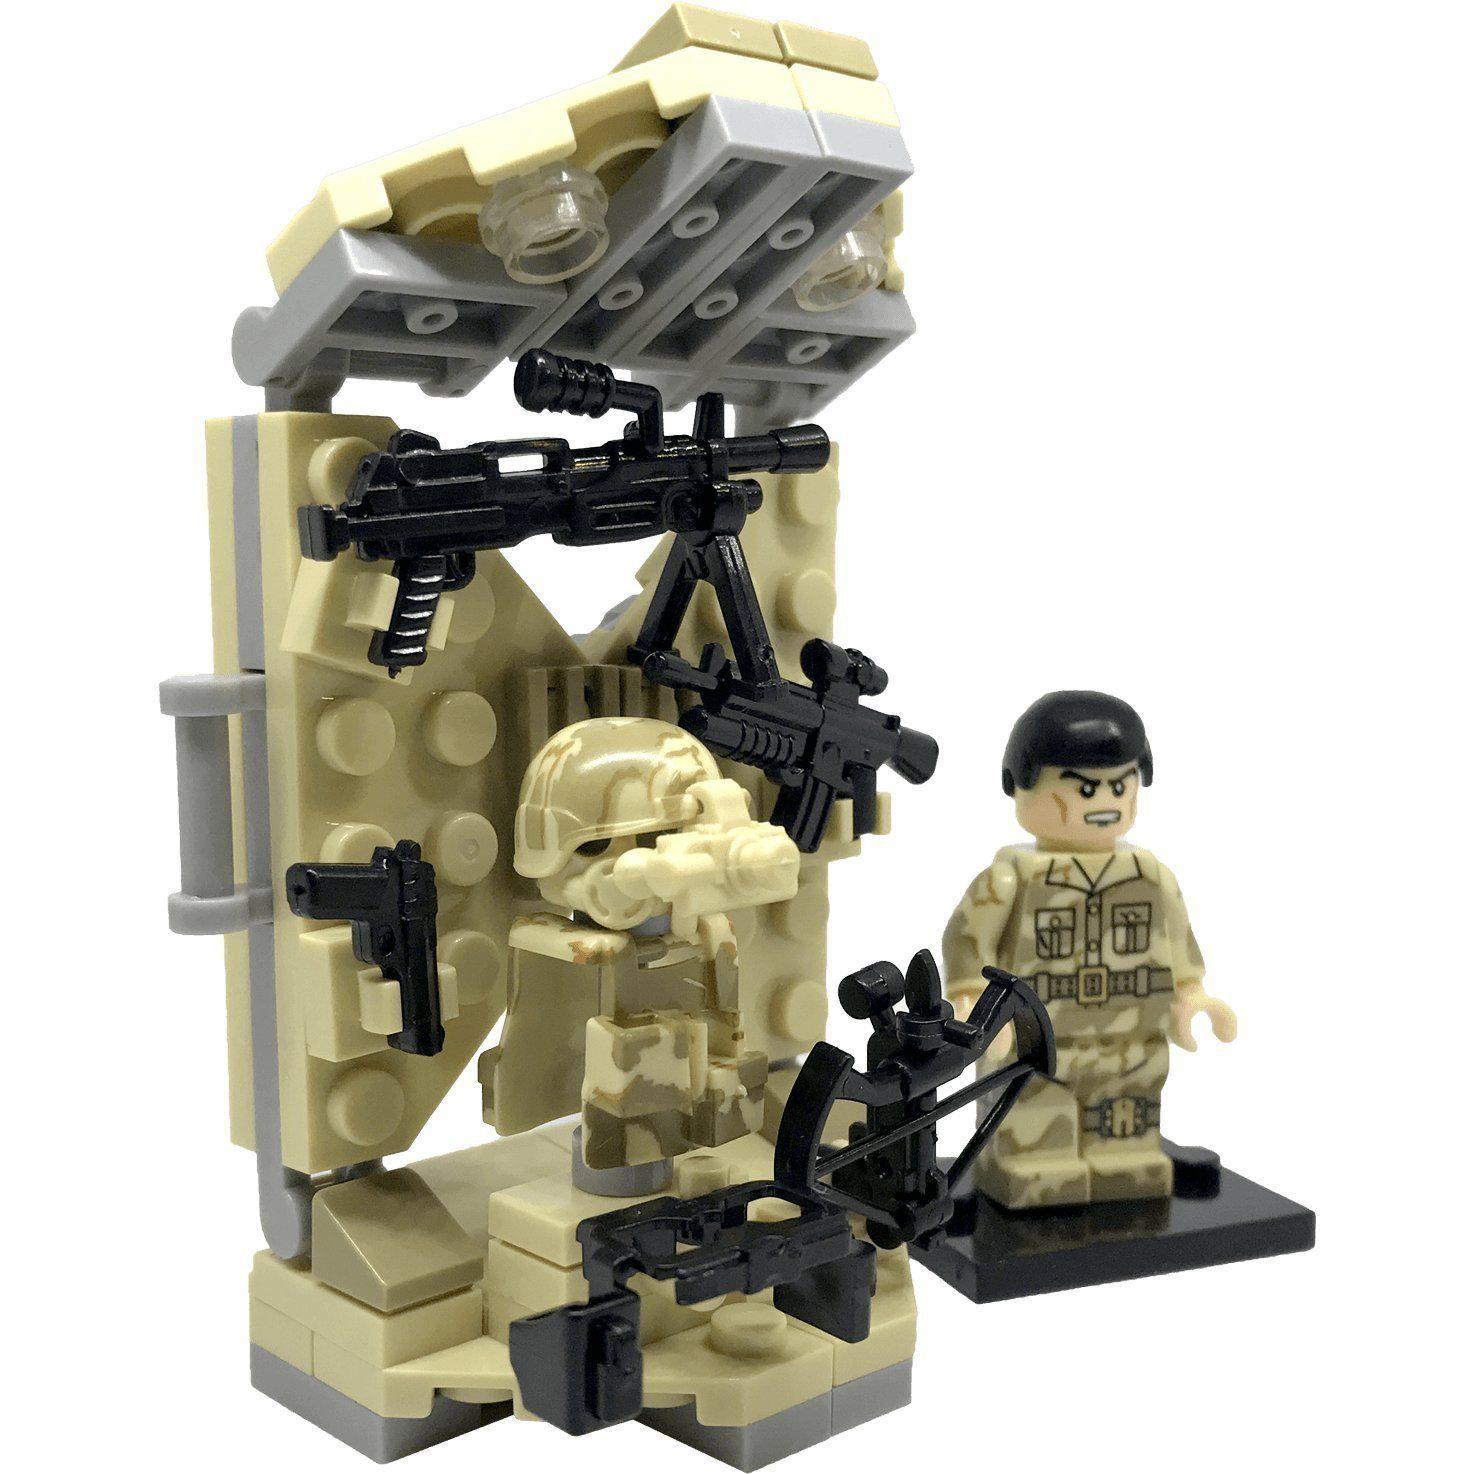 Lego militaire WW2 blocs armée soldat moto avec briques Gun Building